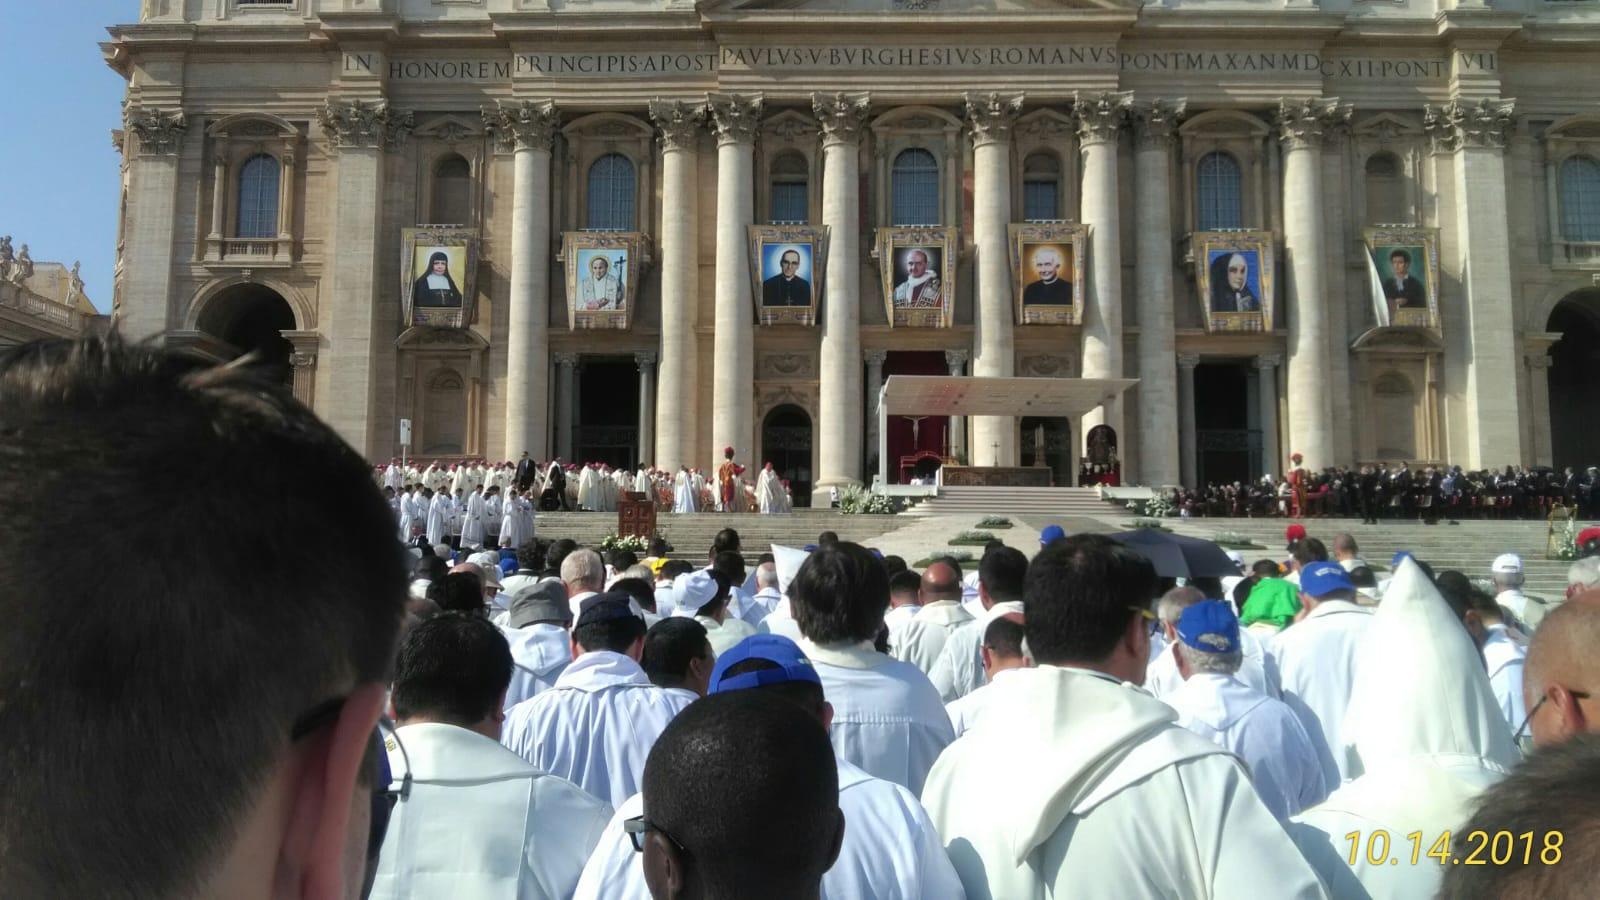 10-14-18-oscar-romero-canonization-fr-mike-rome (4)